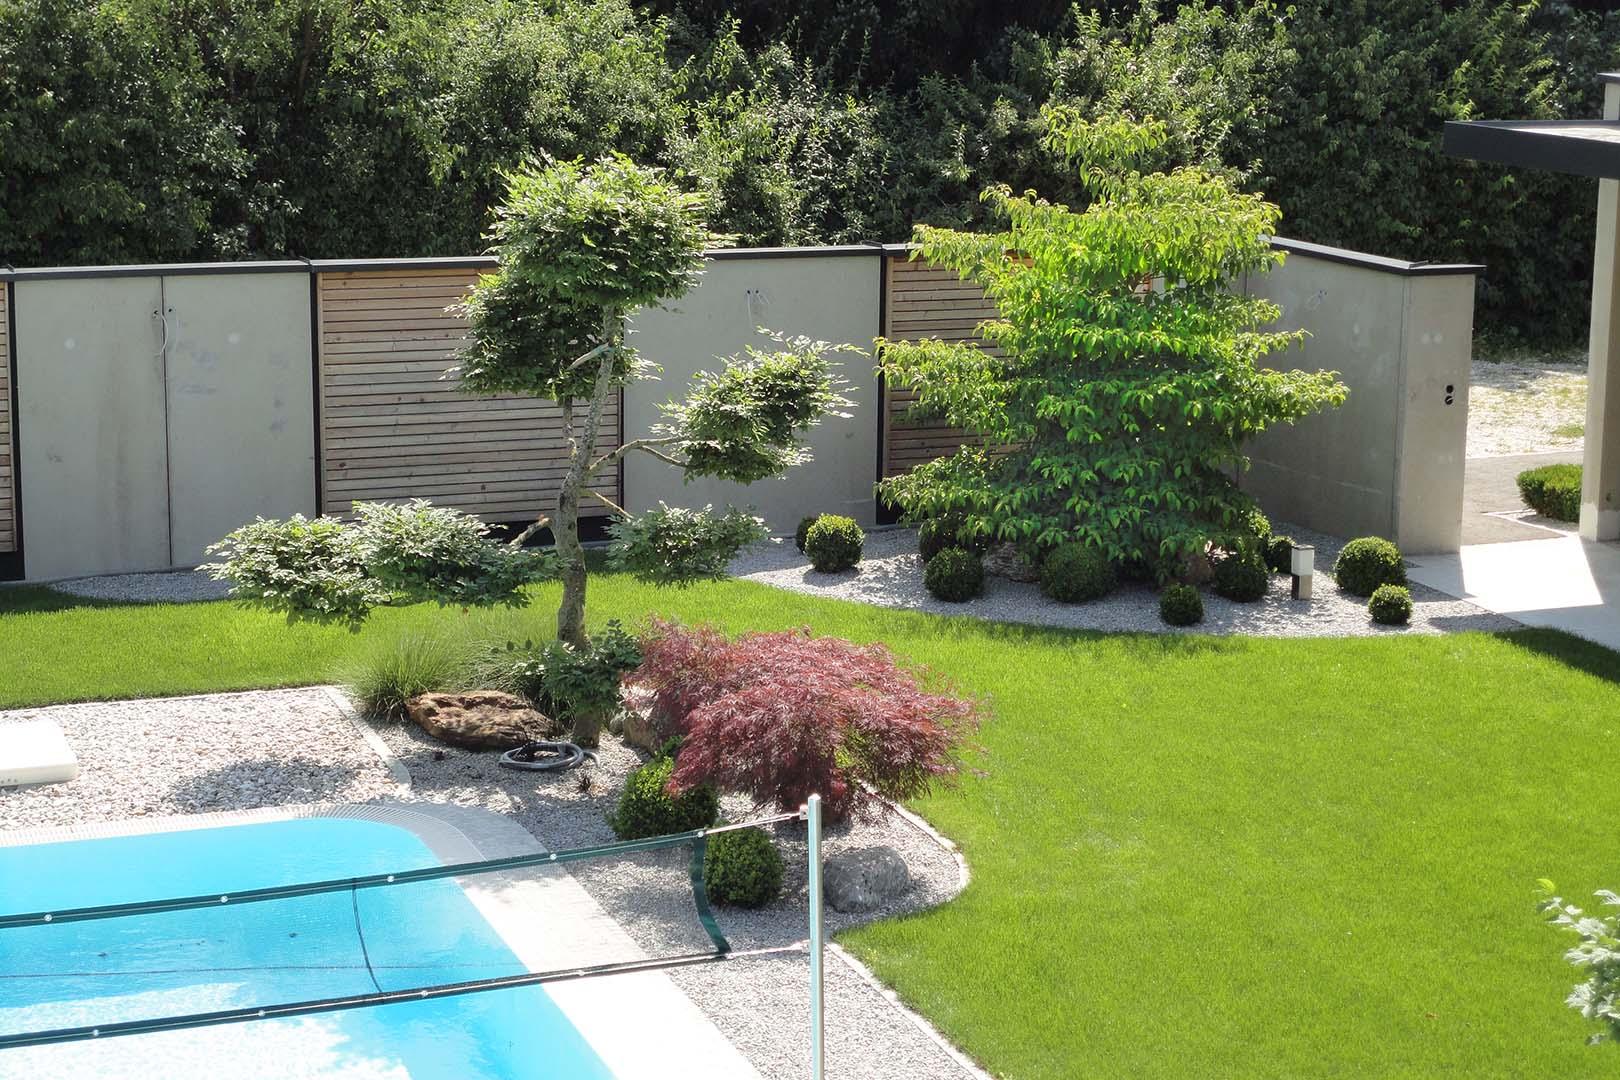 Gartengestaltung Grünpflanzen